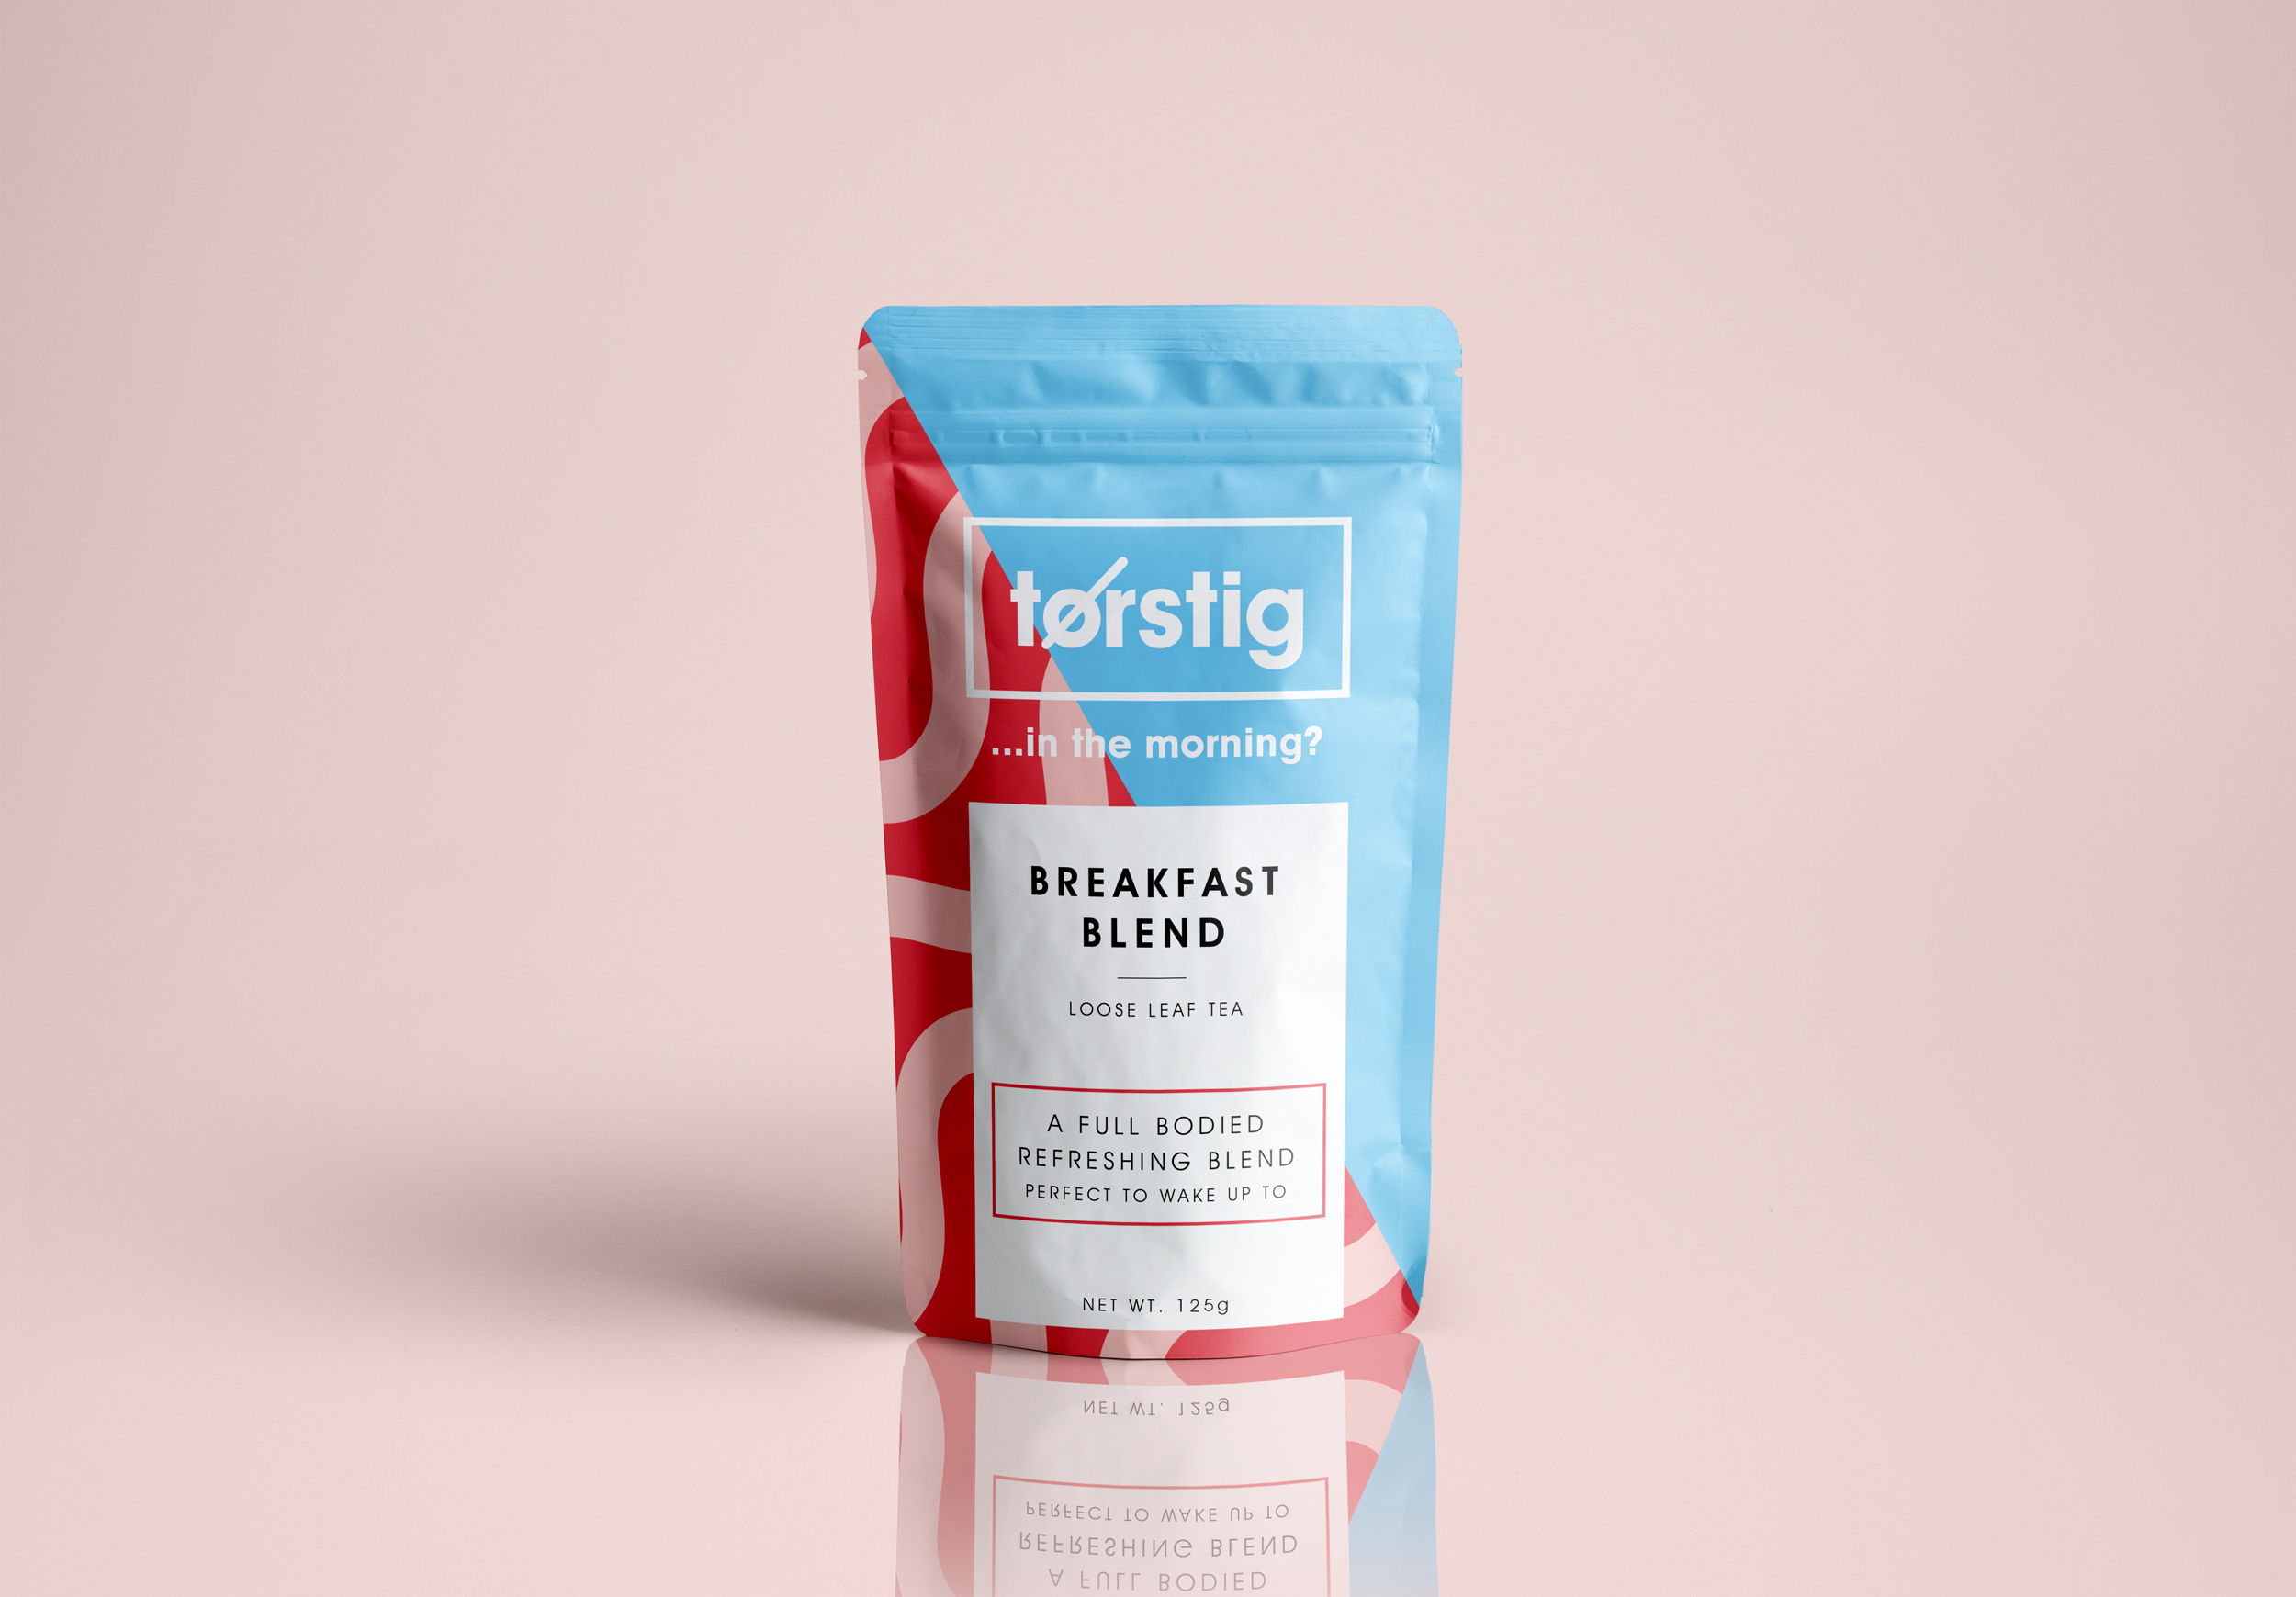 Torstig-Breakfast-Plastic-Pouch-Packaging-MockUp.jpg